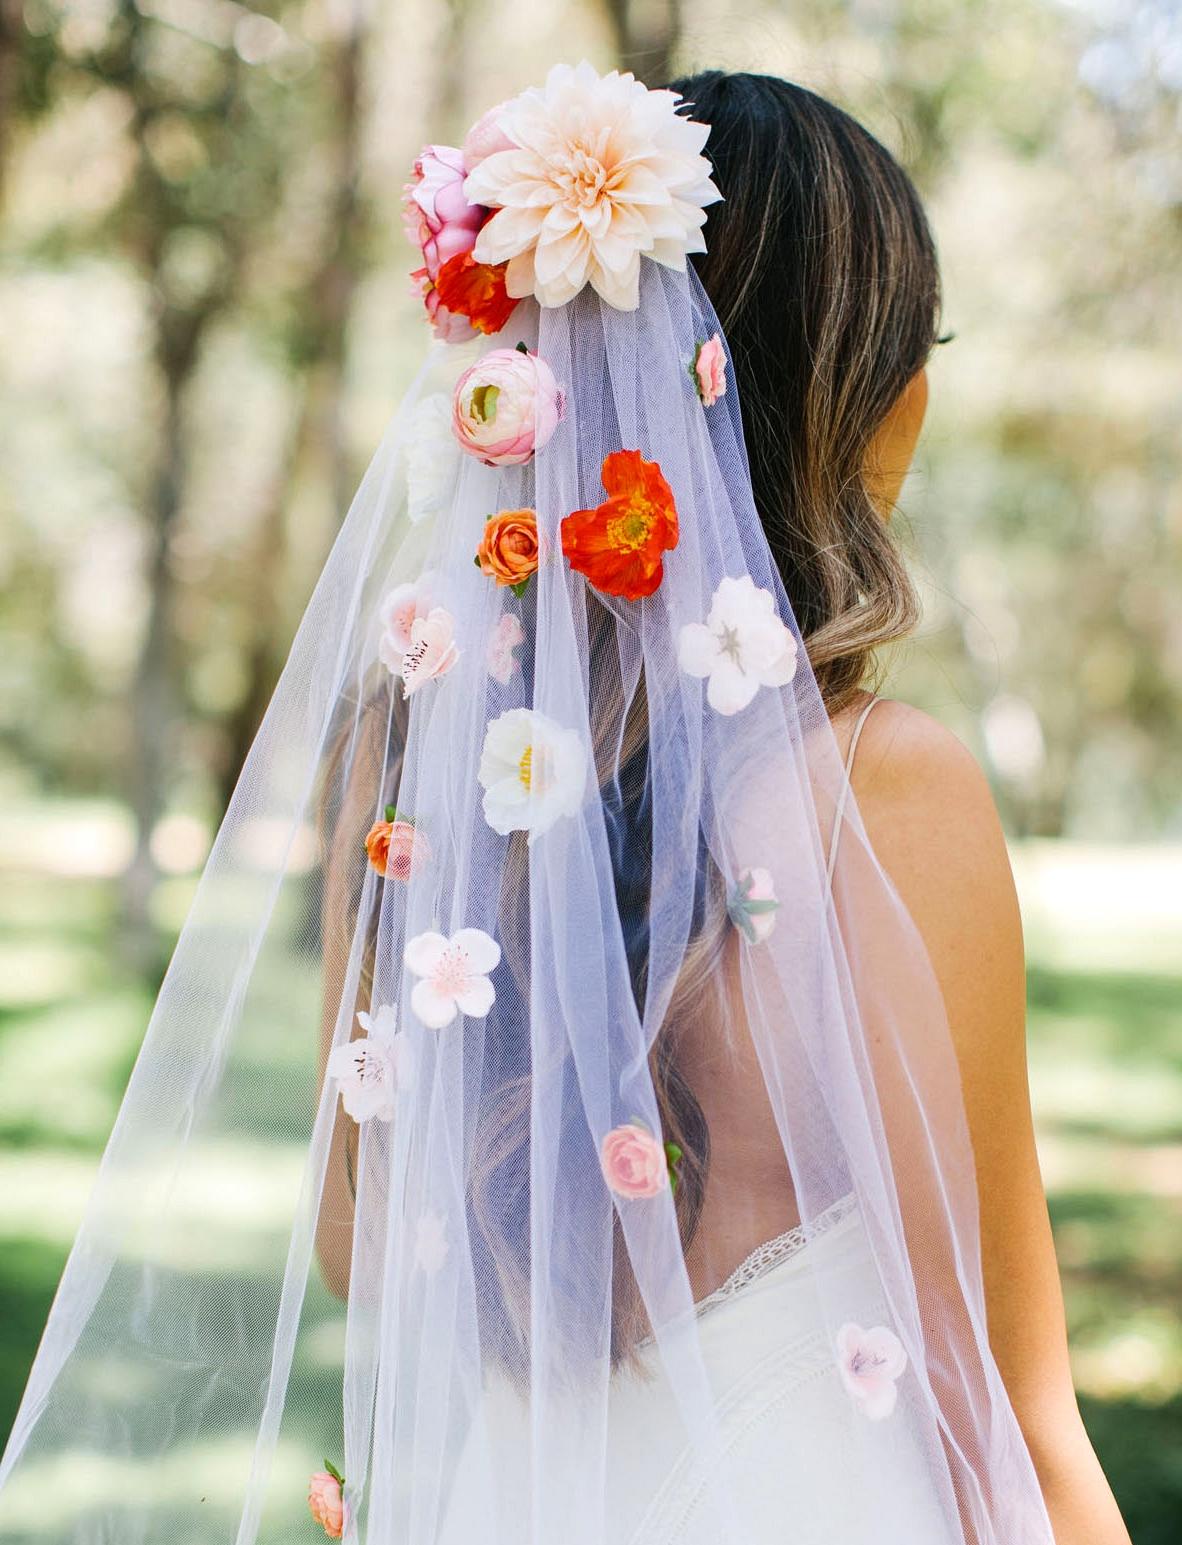 GWS x Afloral Floral Veil DIY